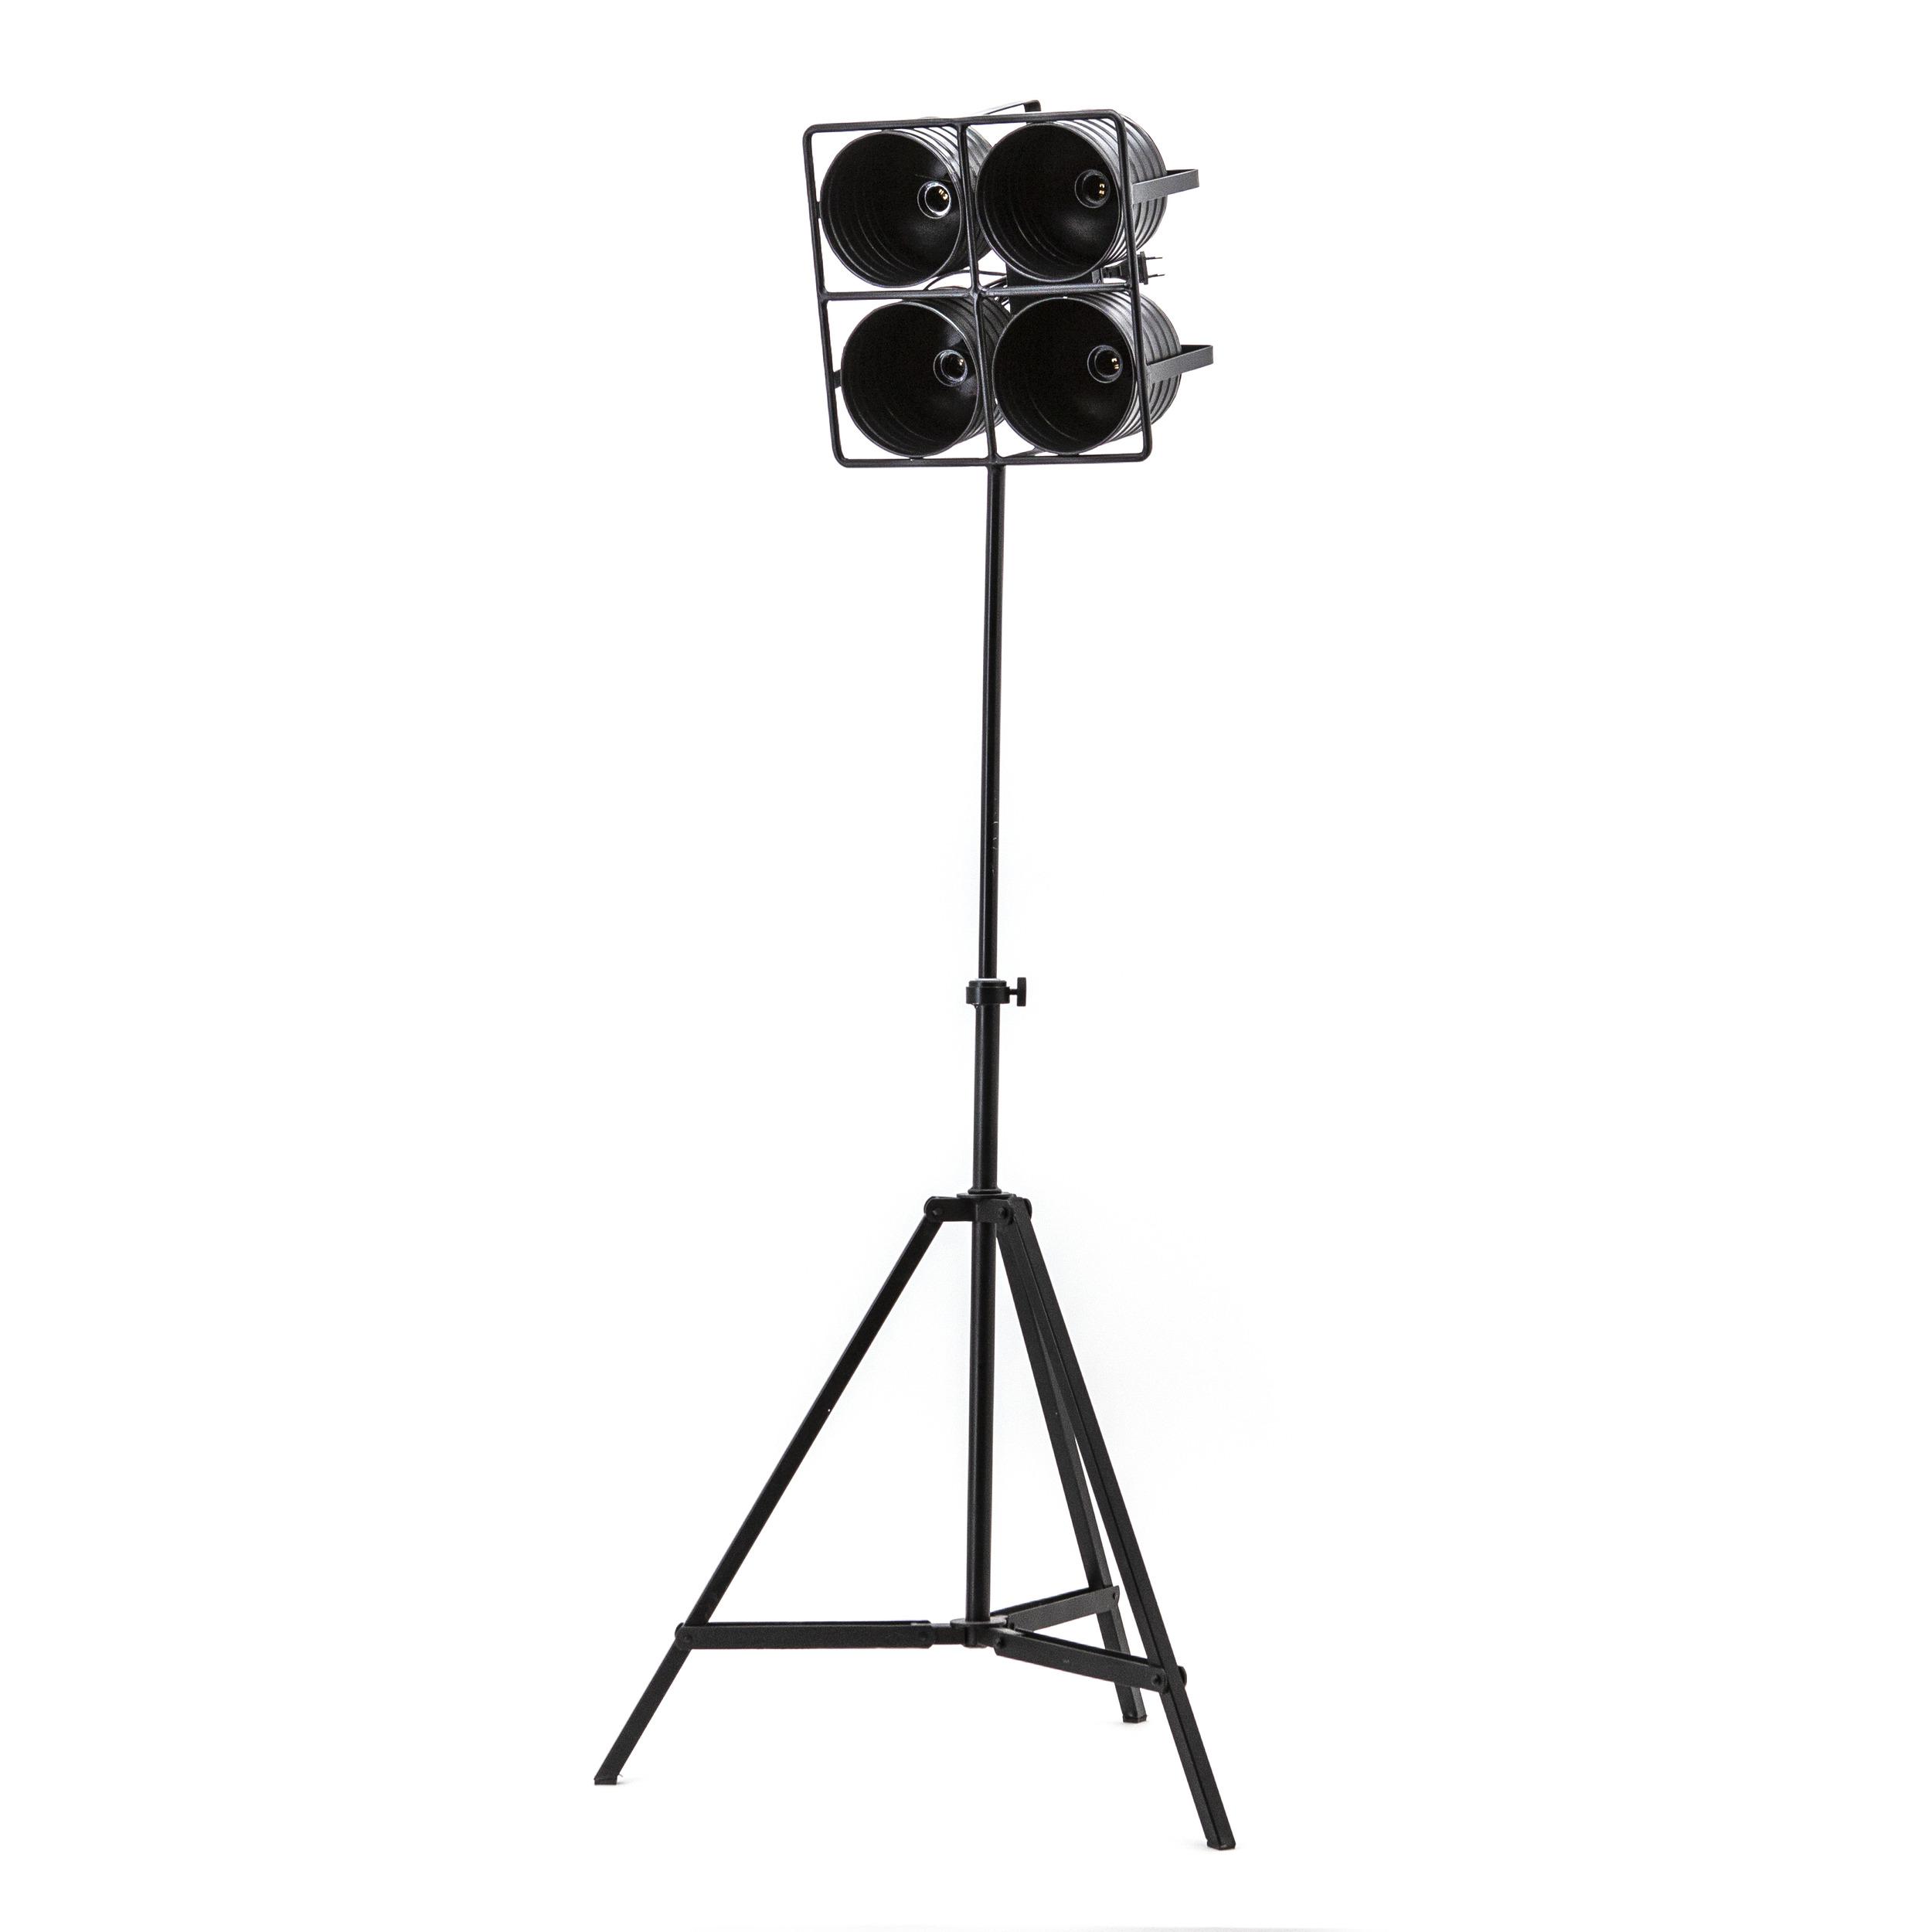 By-Boo Vloerlamp 'Minack' 4-lamps, kleur zwart